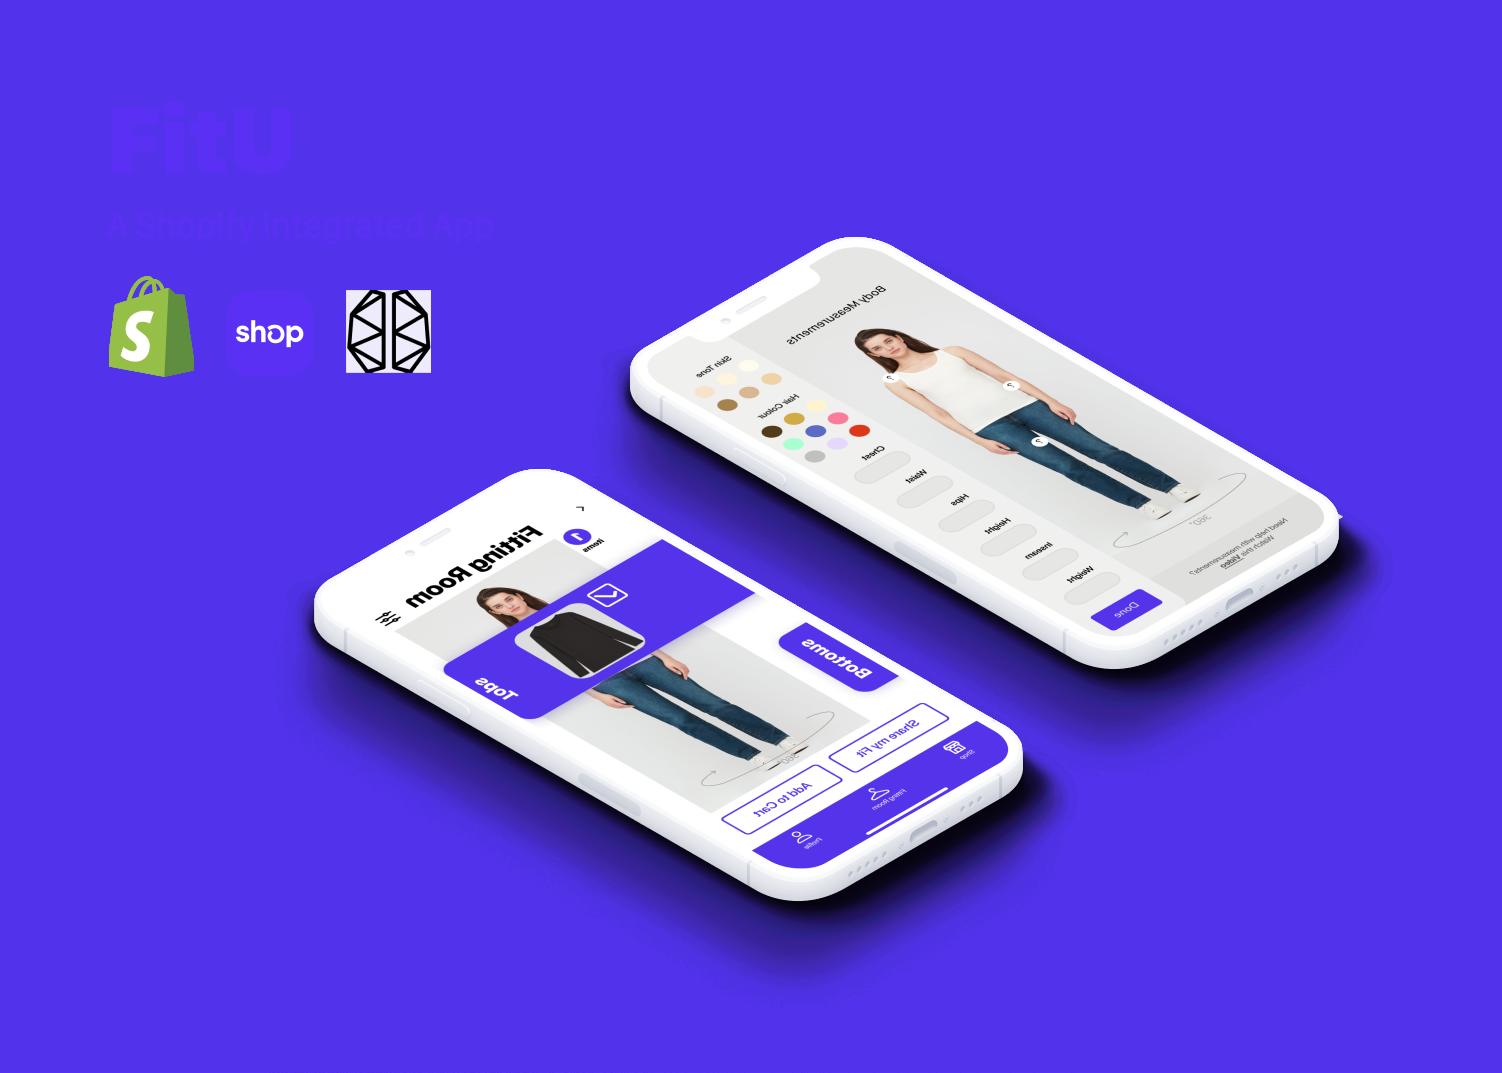 FitU by Shopify